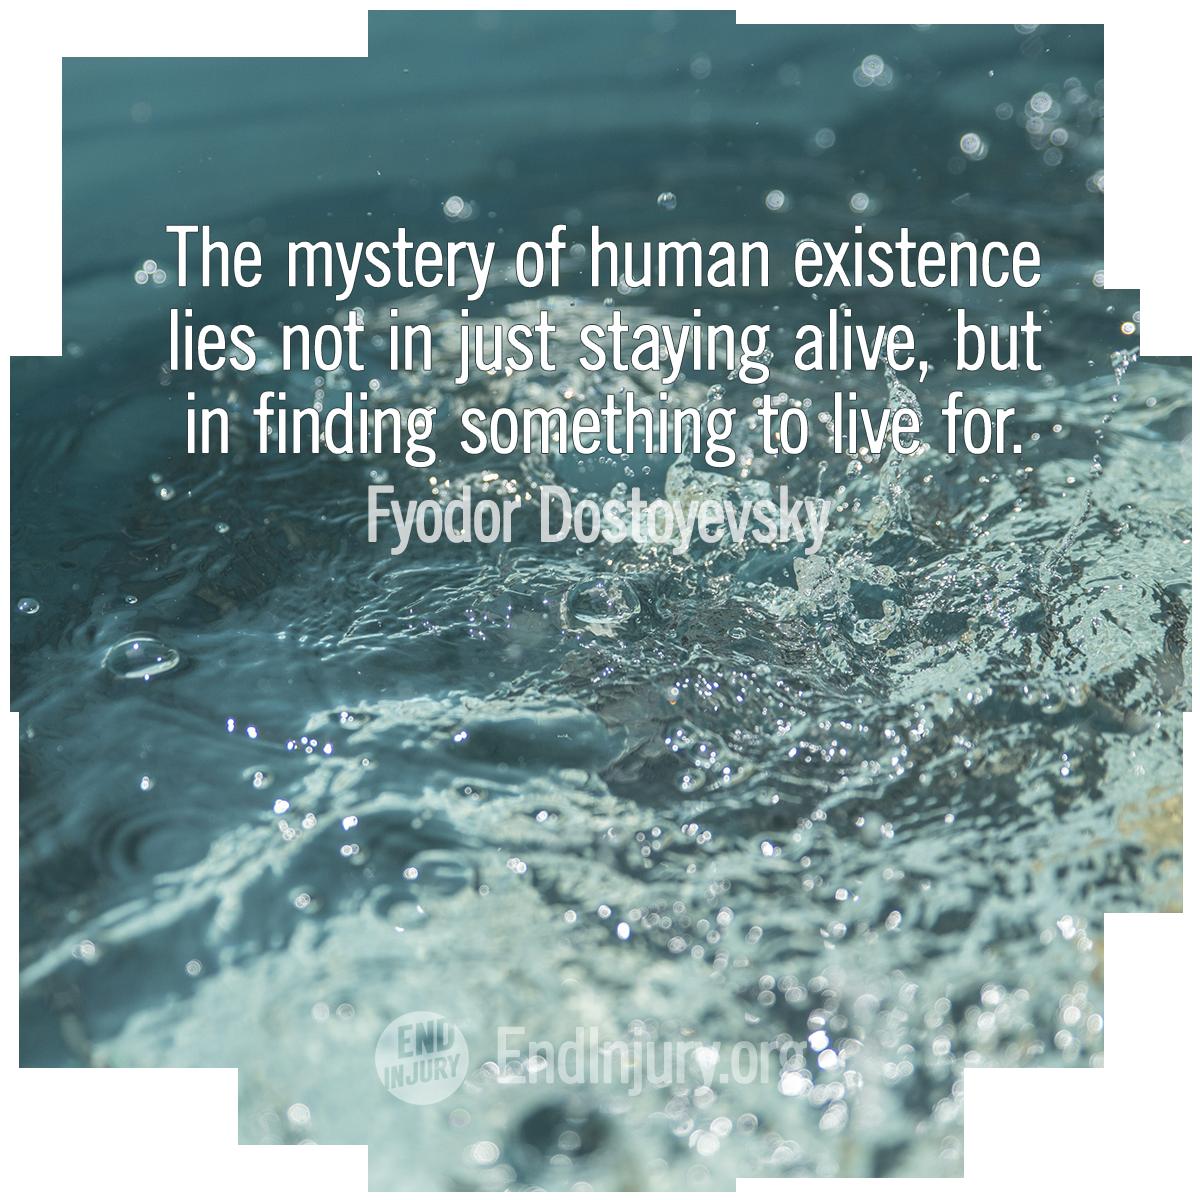 live-dostoyevsky-quote-photo.png